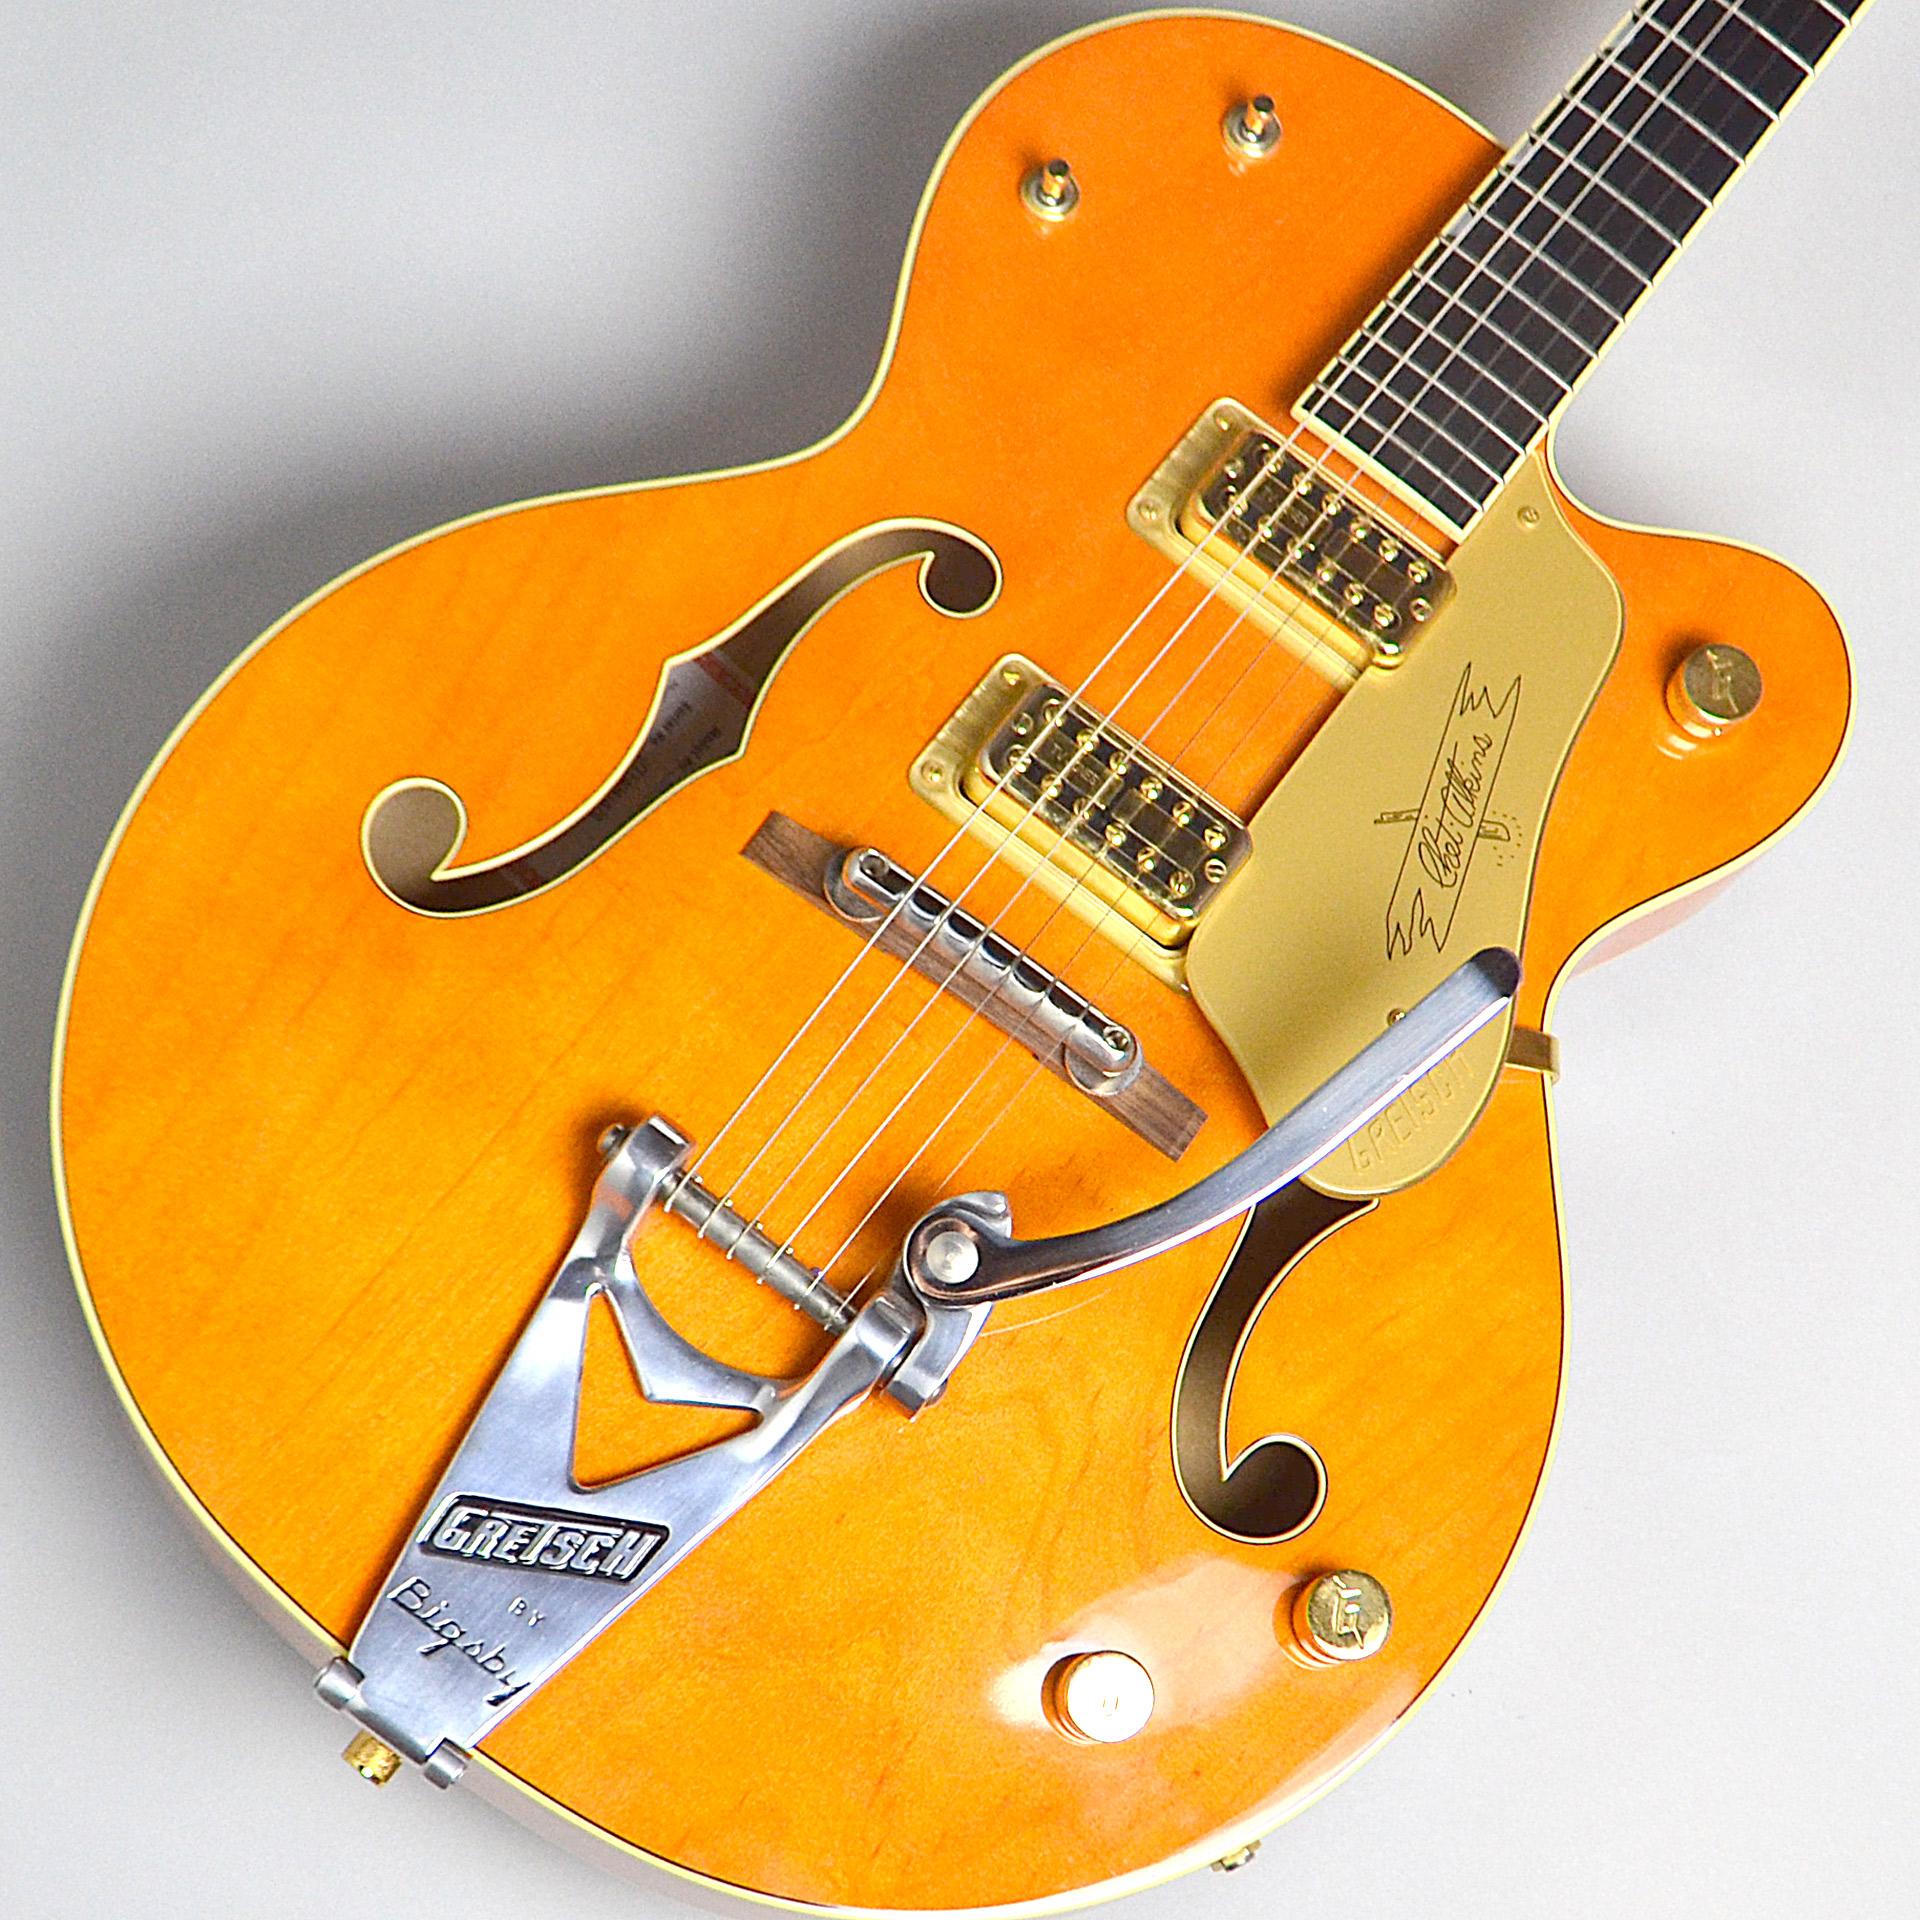 G6120-1959LTV Chet Atkins Hollow Body